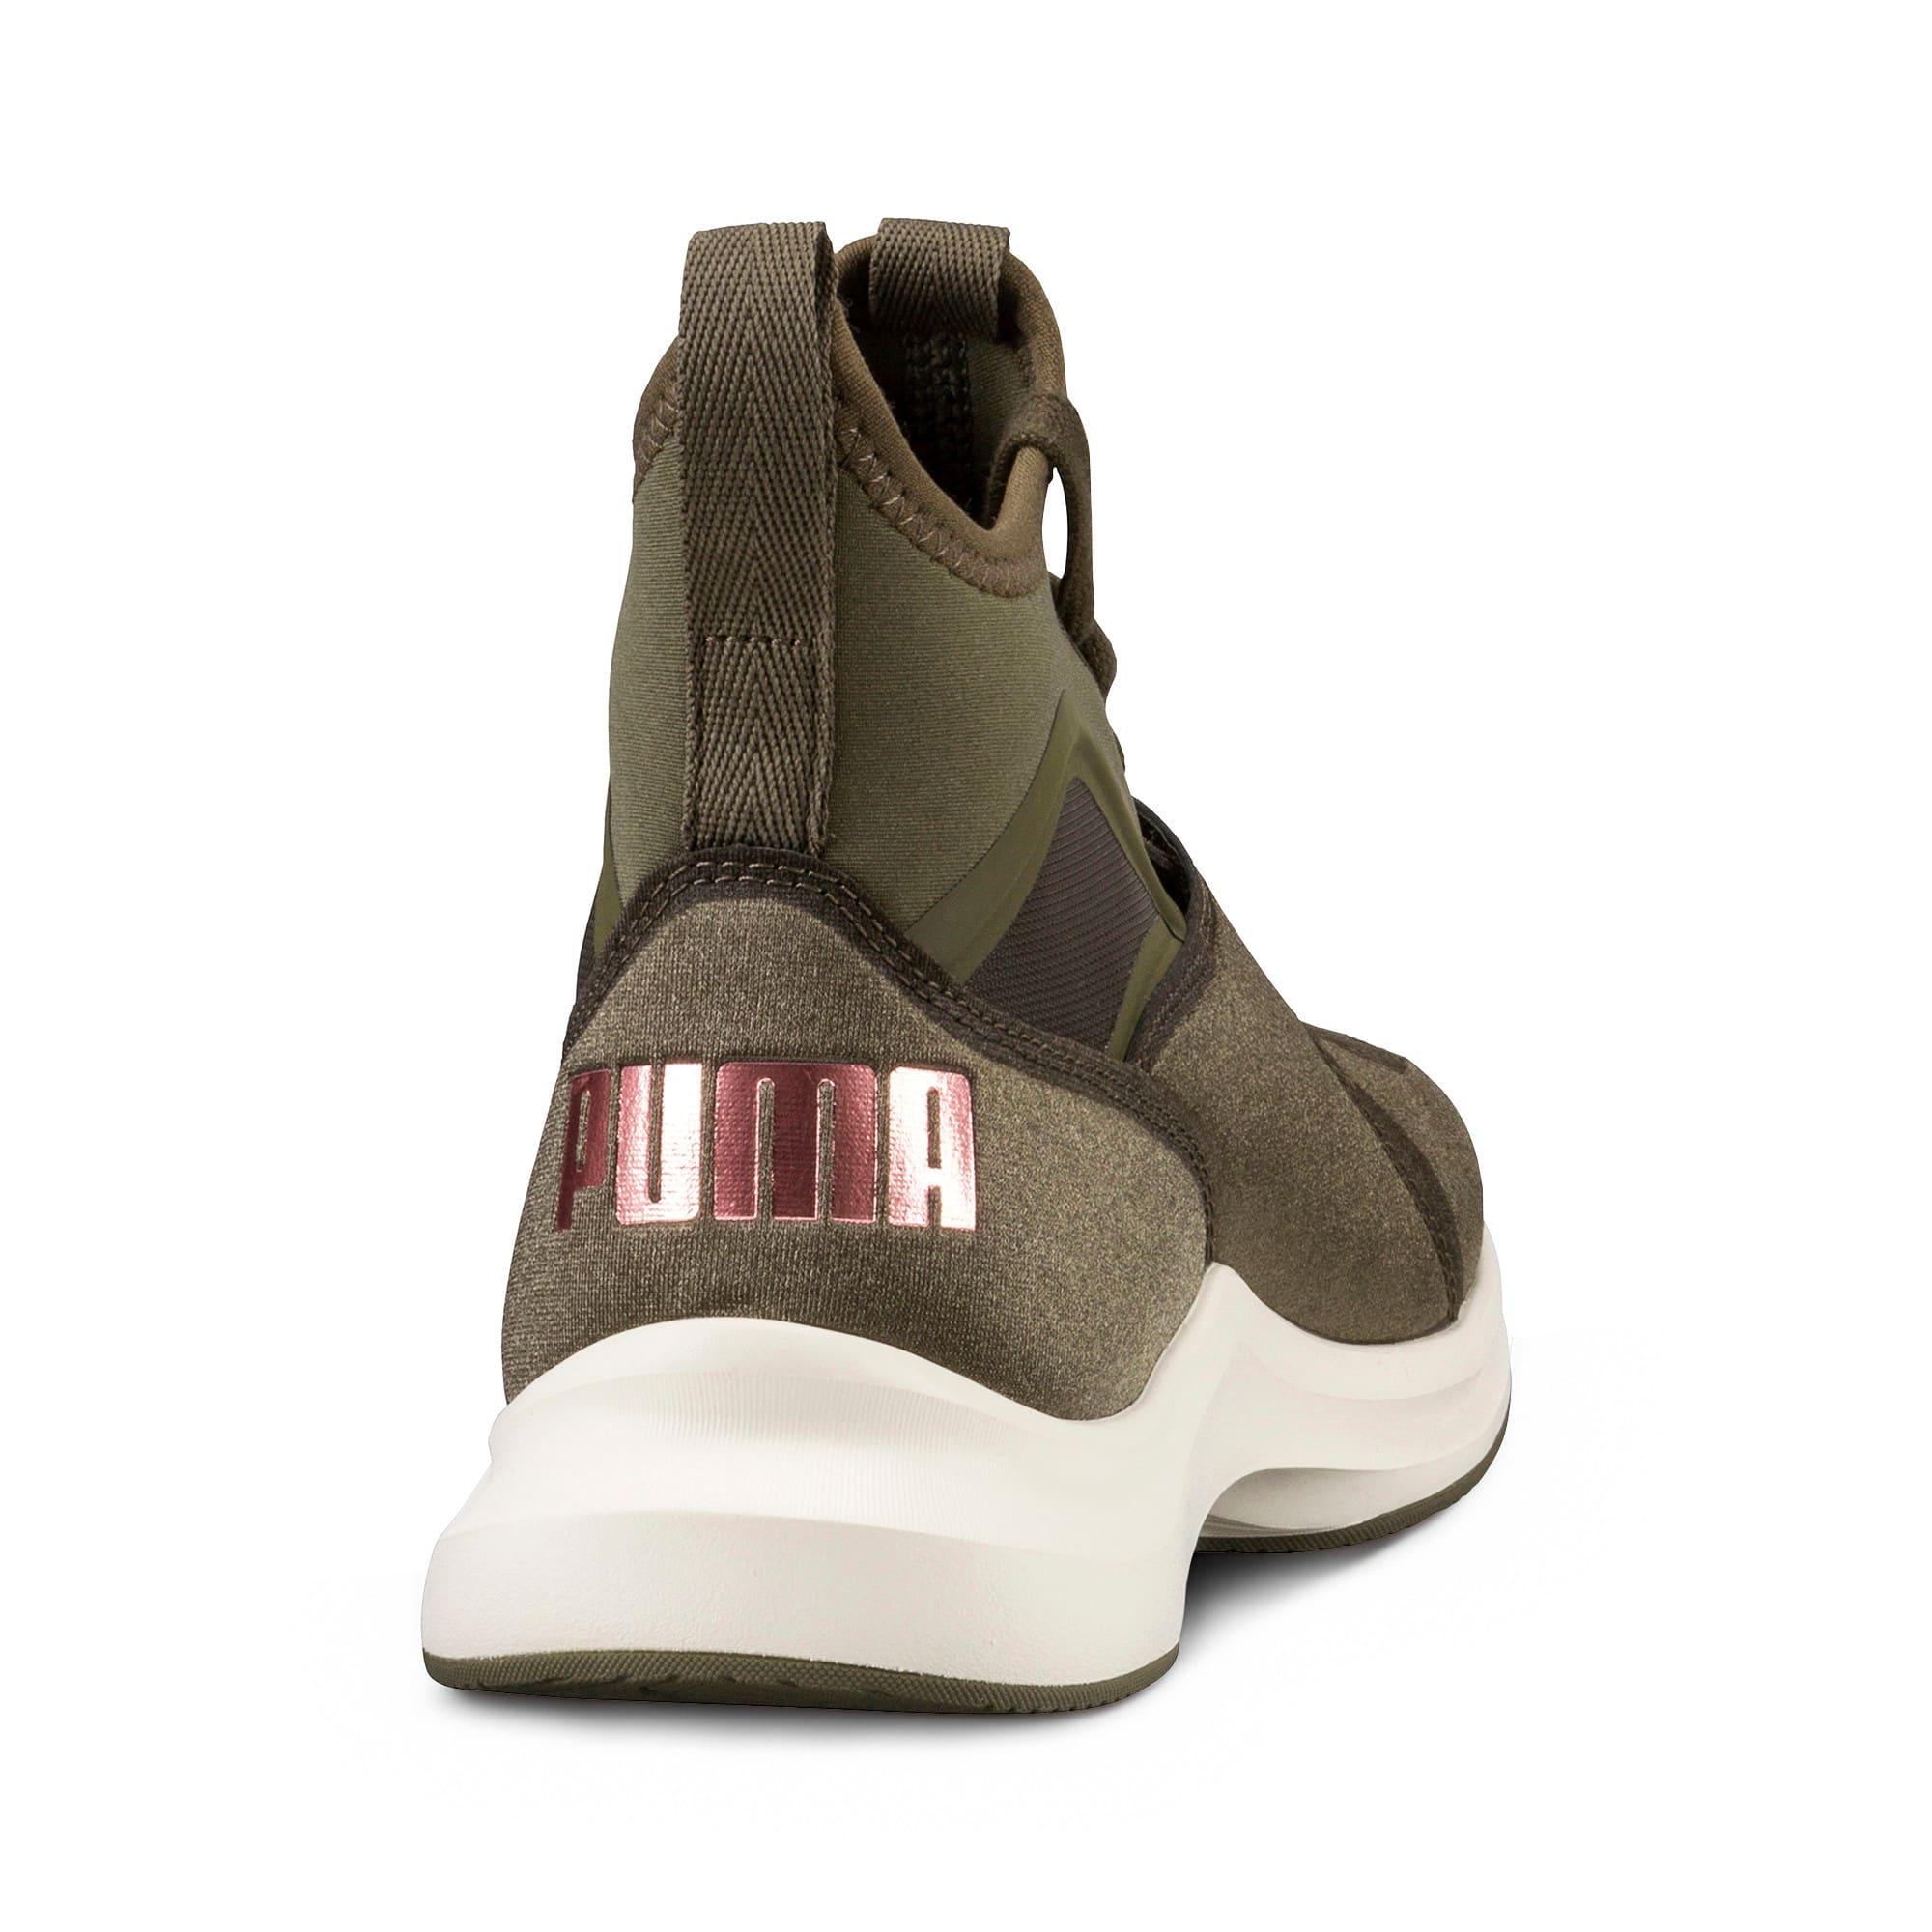 Thumbnail 4 of Phenom Women's Training Shoes, Olive Night-Whisper White, medium